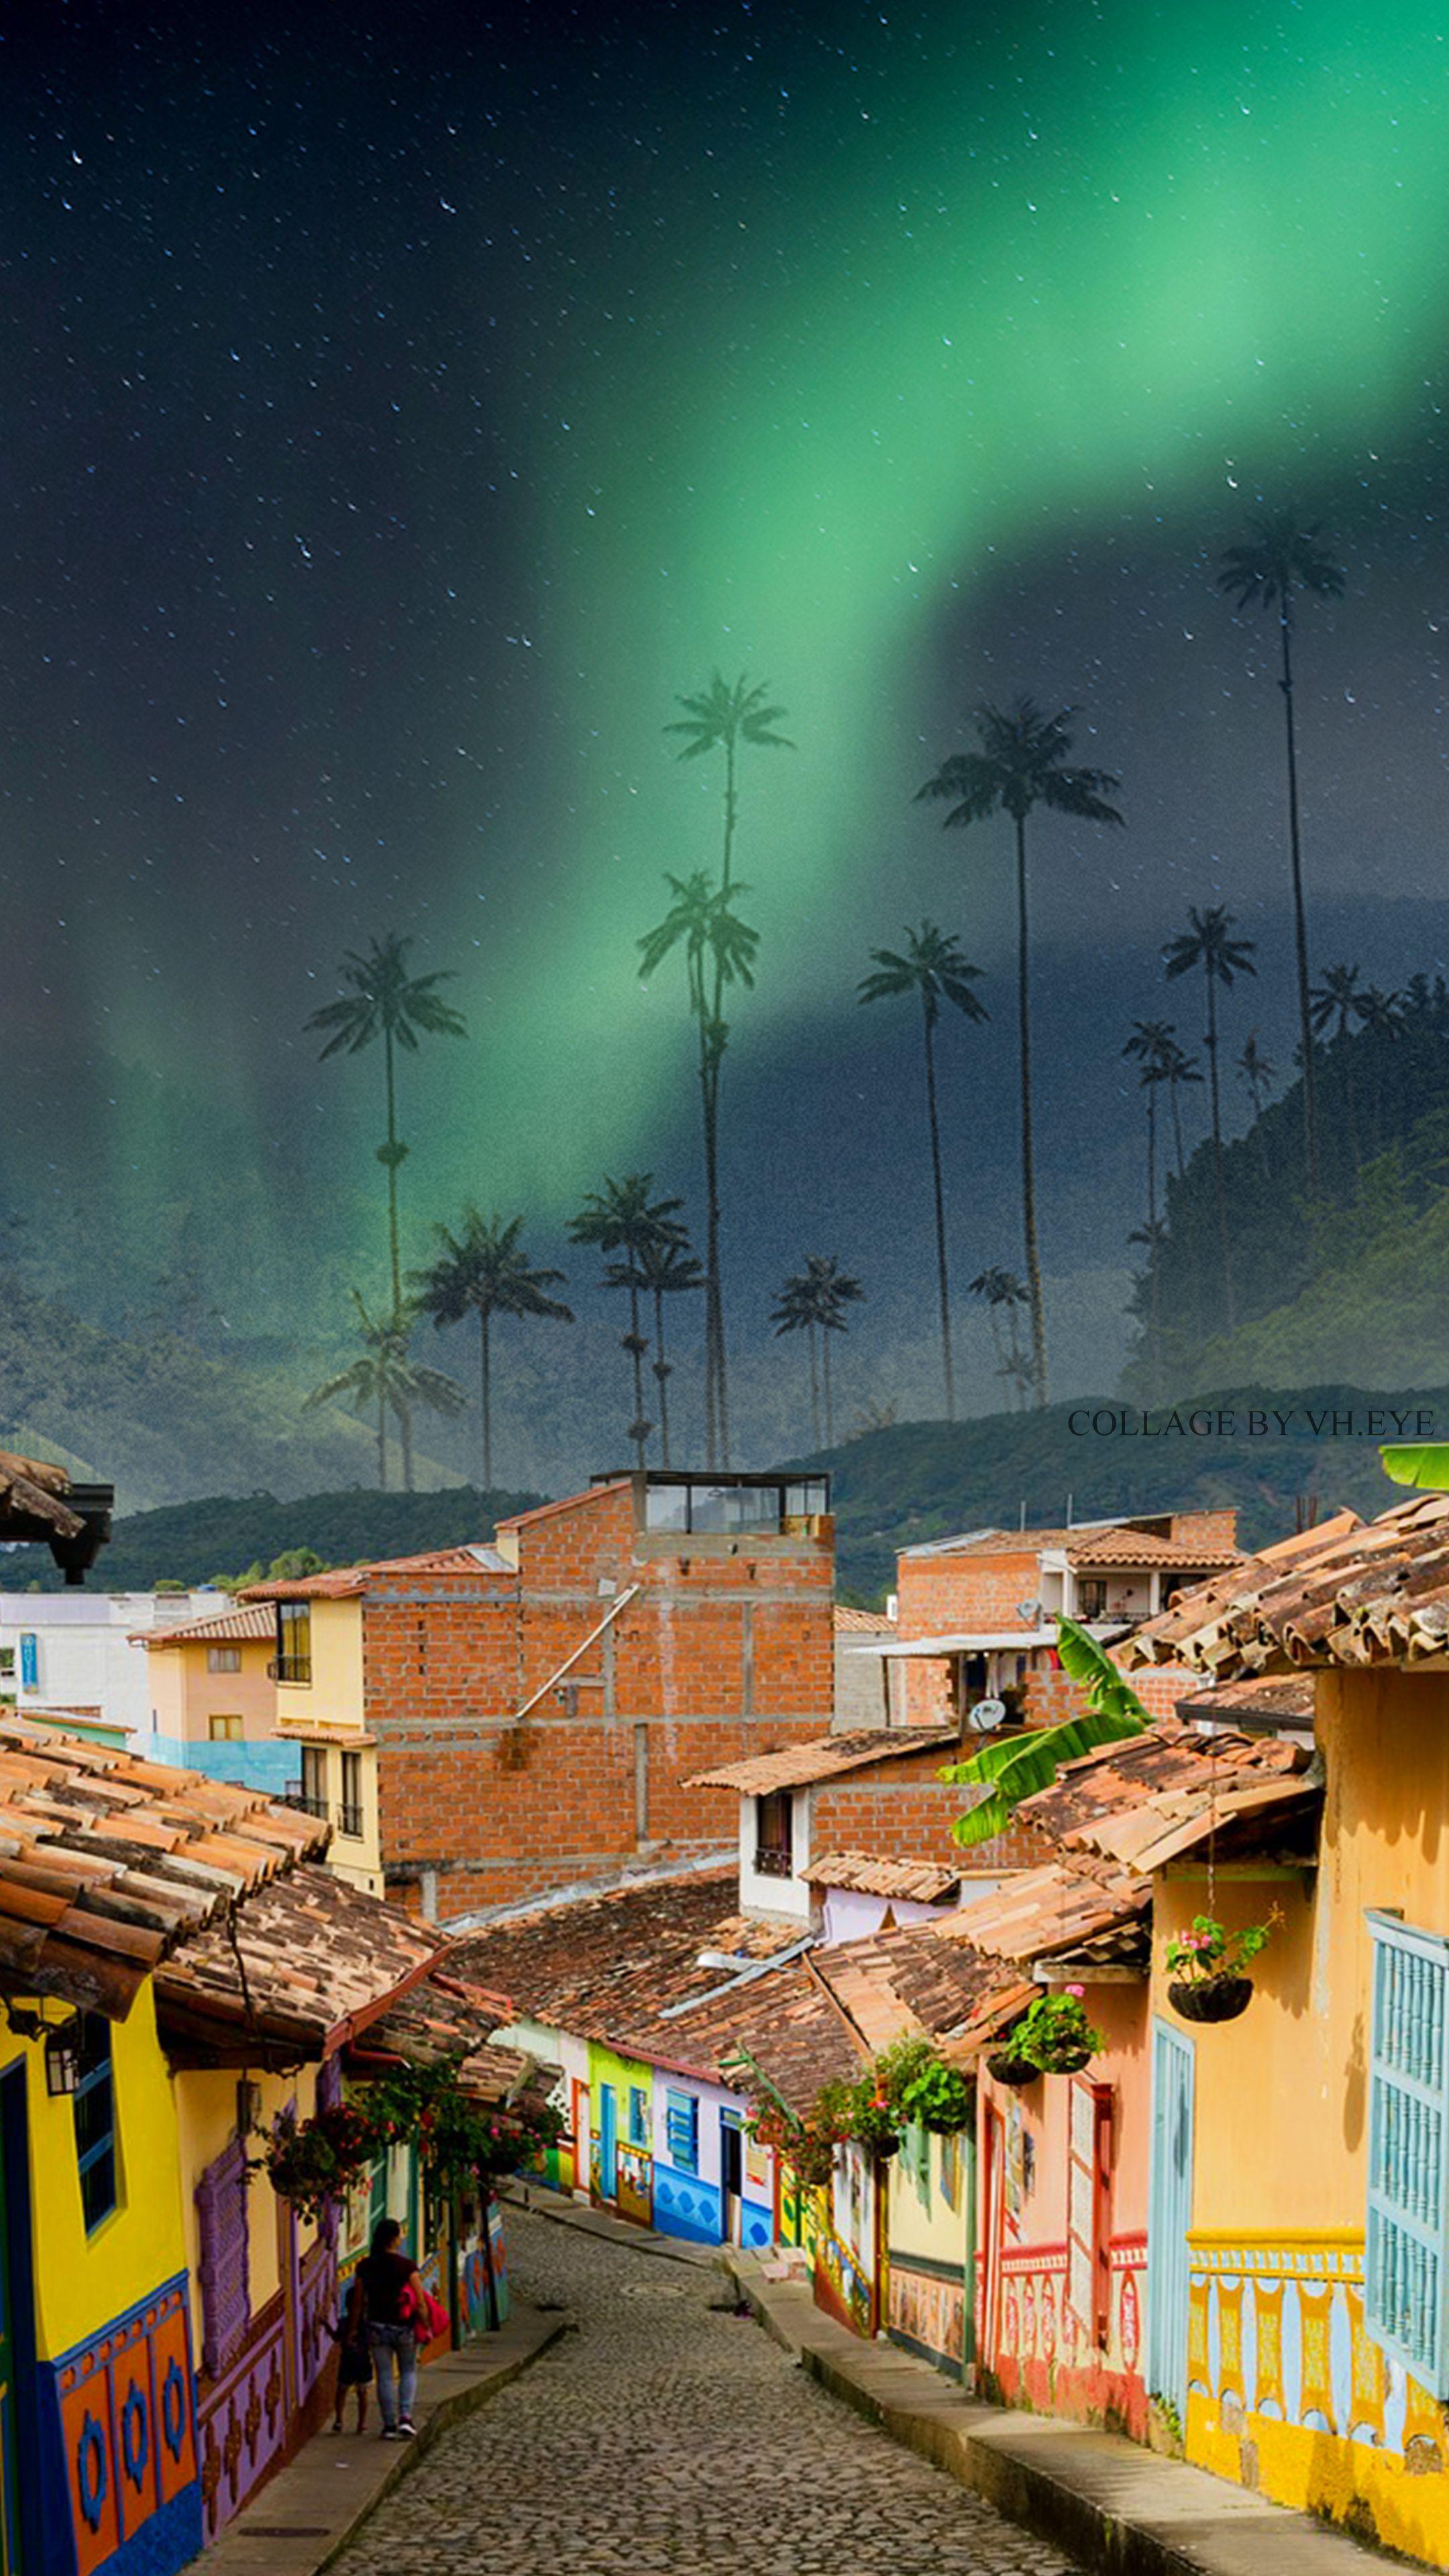 Colombia Valle De Cocora Wallpaper Iphone Android Collage Art By Vh Eye Northern Lights Aurora Borealis Mit Bildern